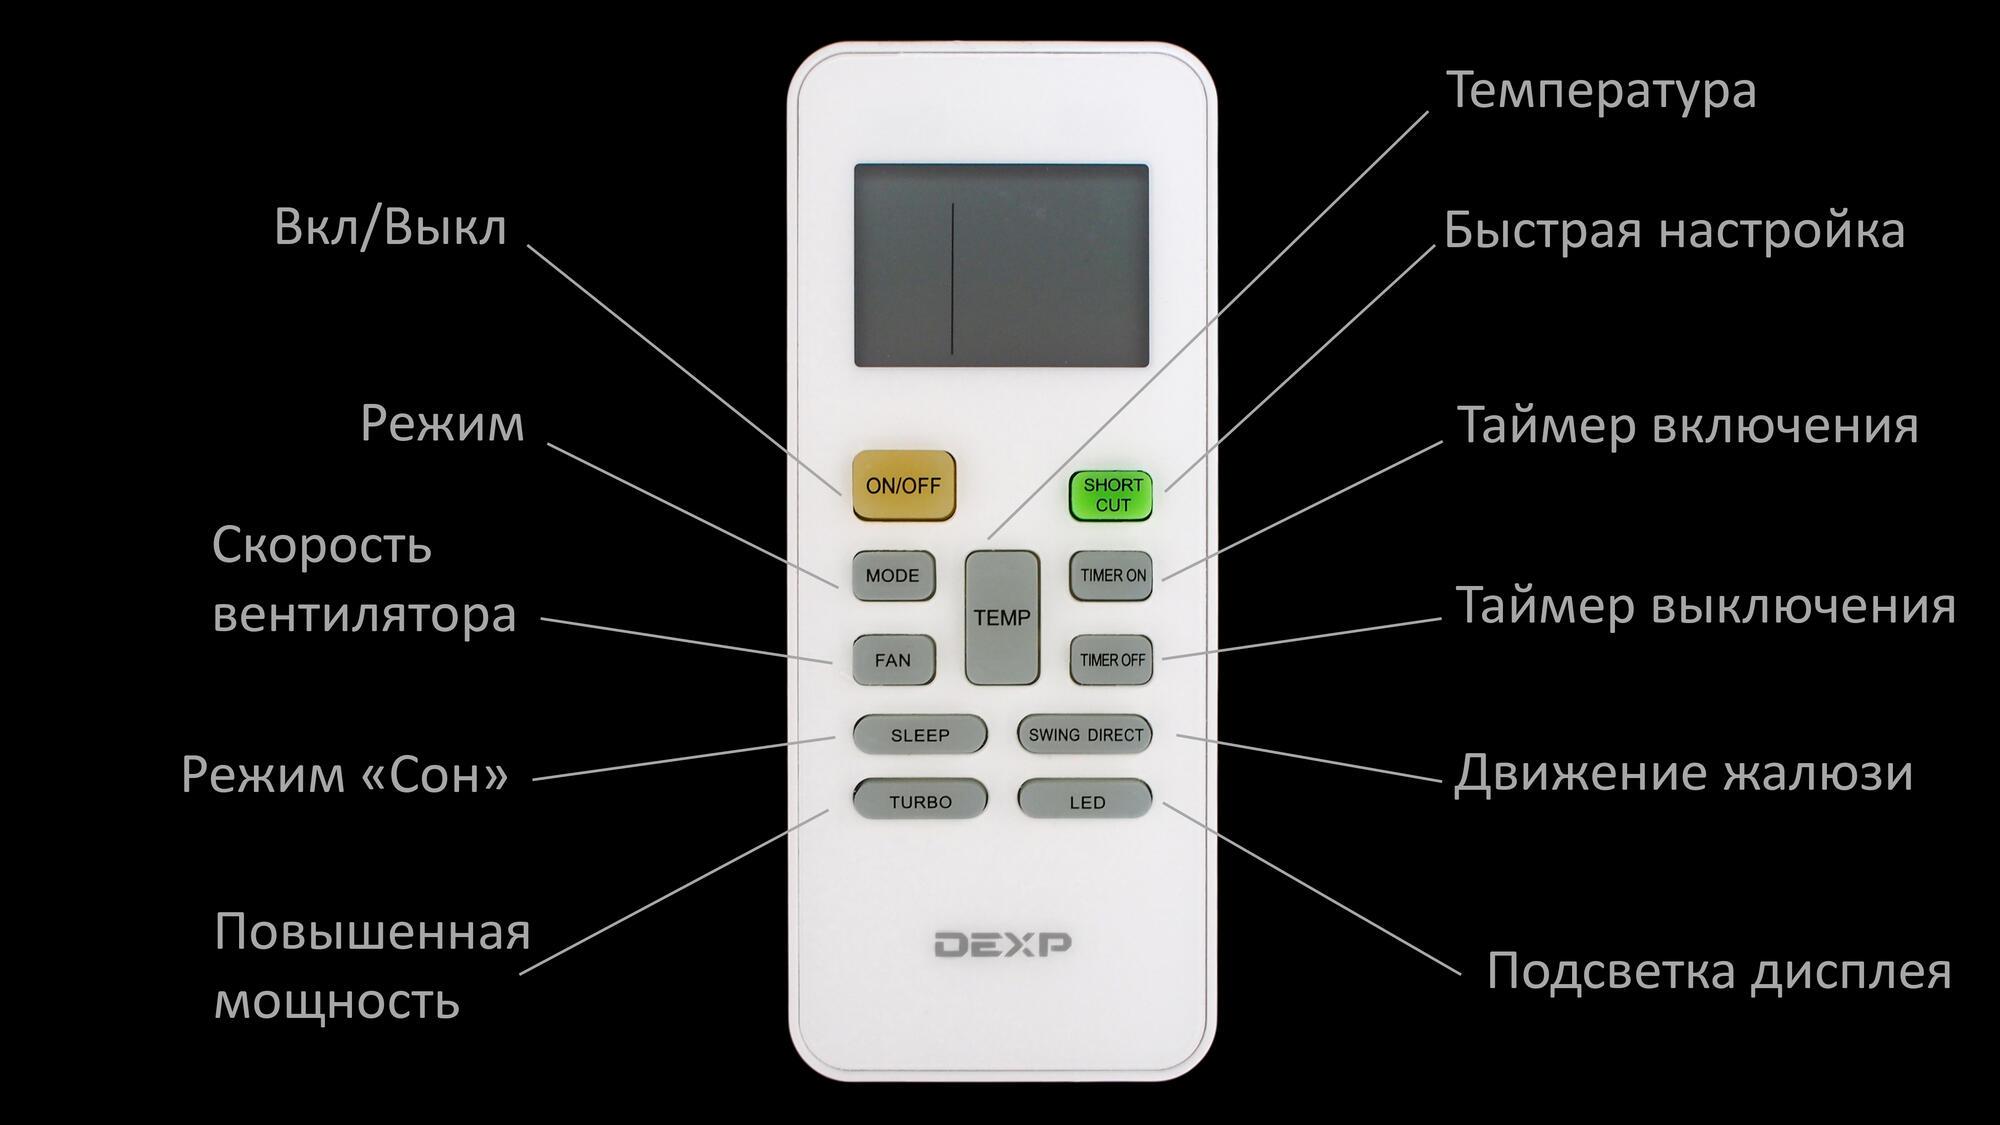 Bytovaya Tehnika - Obzor split-sistemy DEXP AC-R09IMA/W. Leto blizko